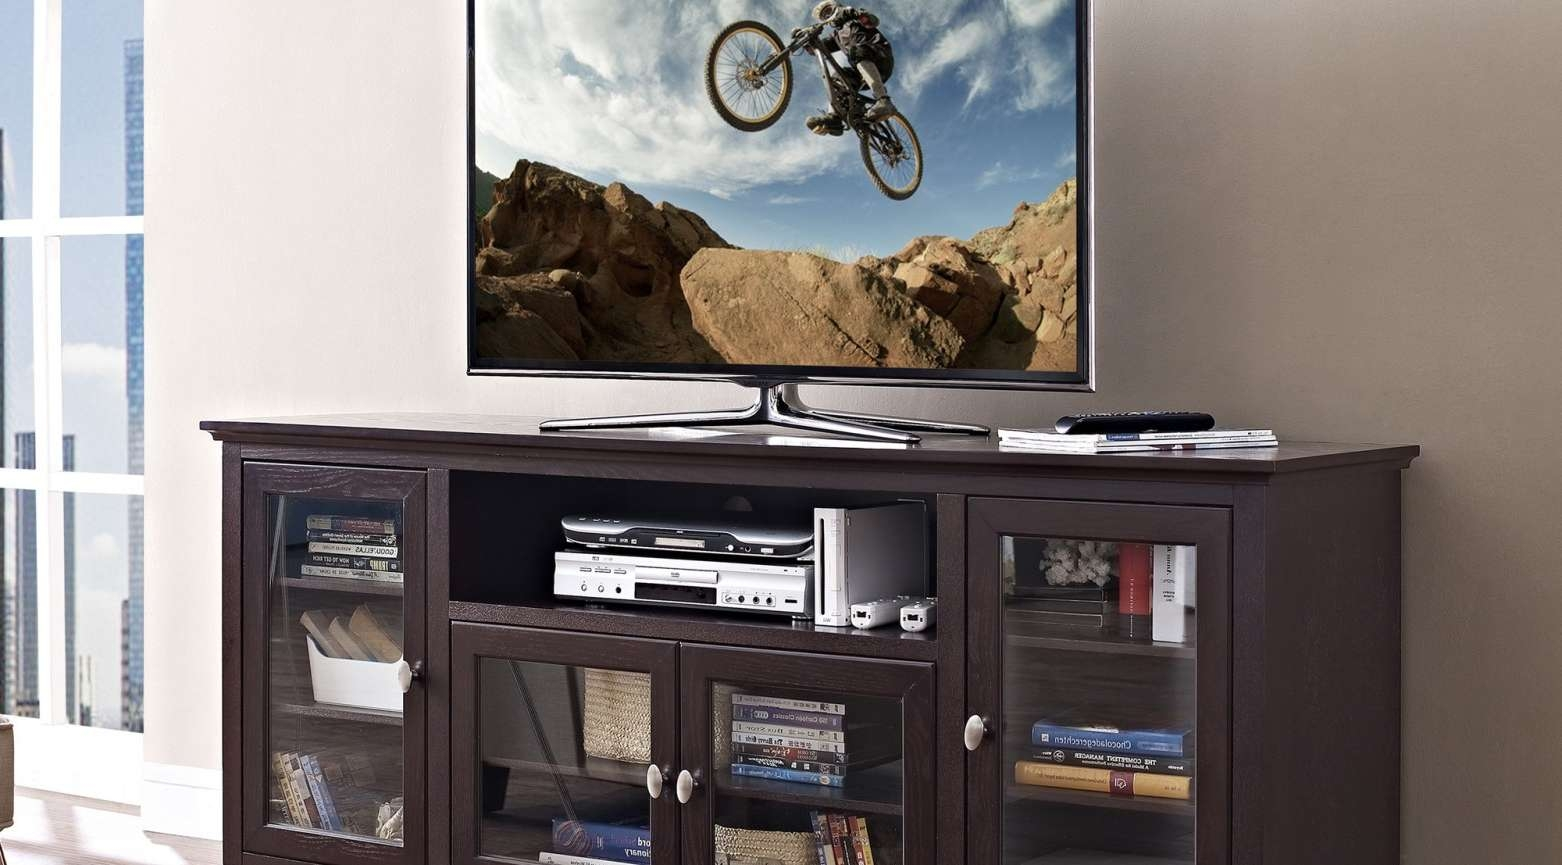 Tv : Cherry Wood Tv Cabinets Terrific Cherry Wood Tv Stands For For Cherry Wood Tv Cabinets (View 11 of 20)